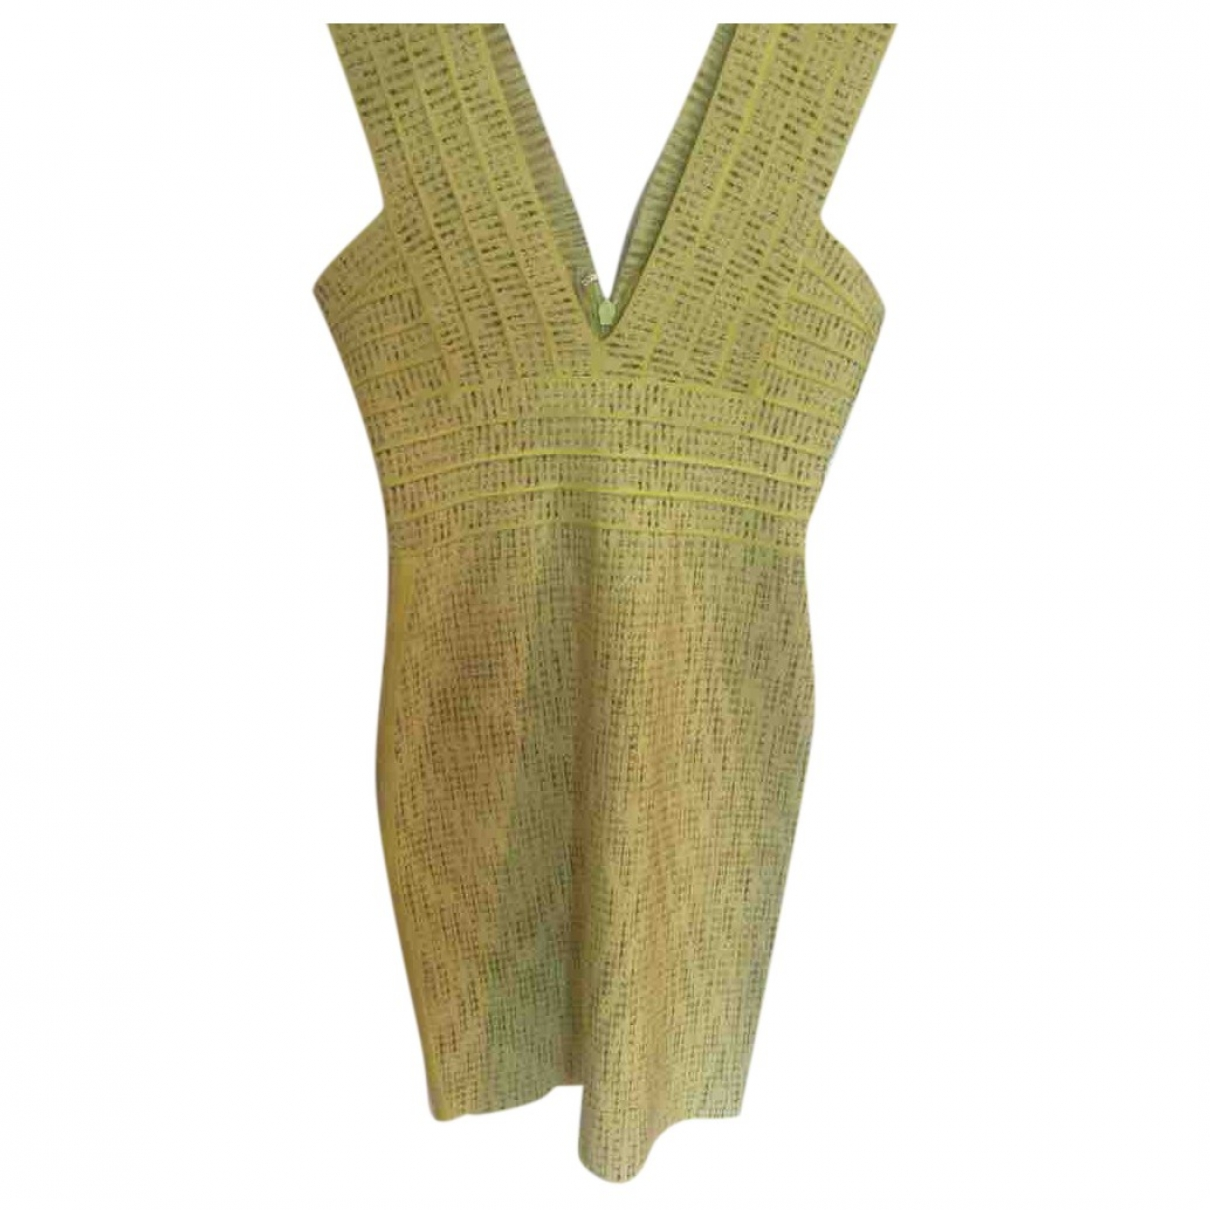 Herve Leger \N Green \N dress for Women M International